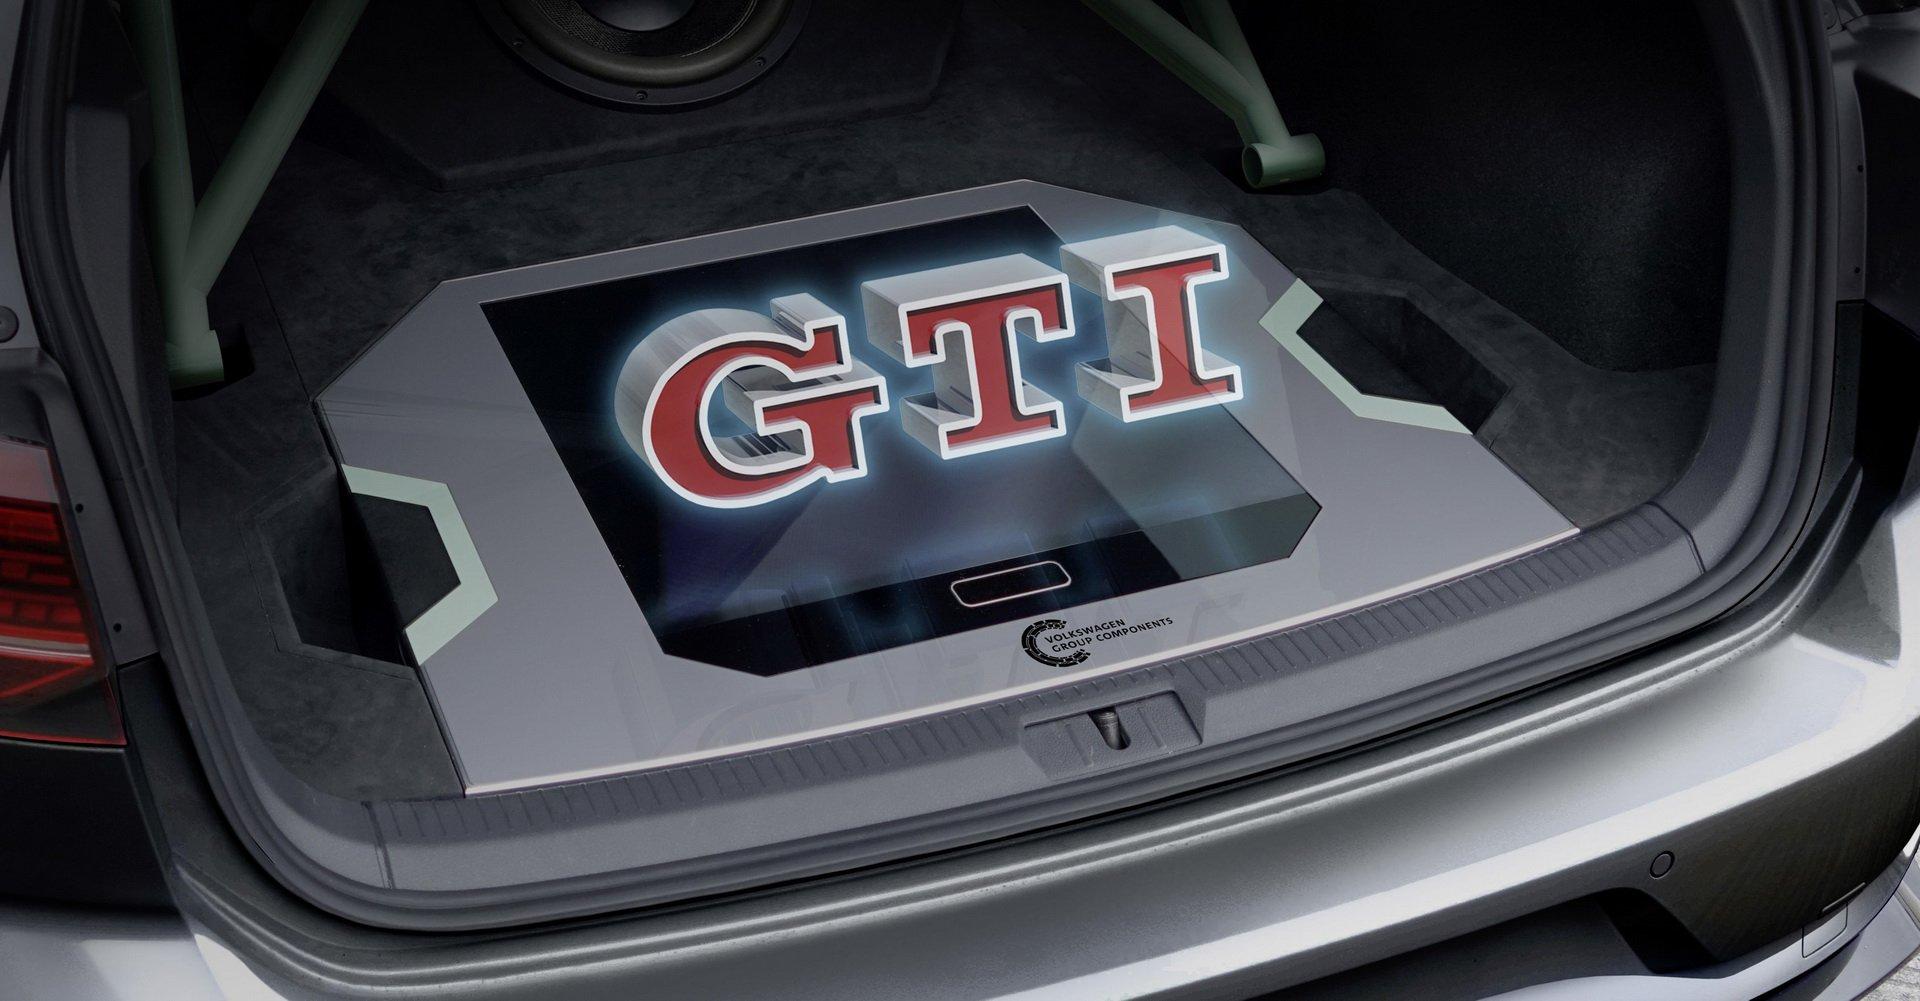 VW-Golf-GTI-Aurora-5